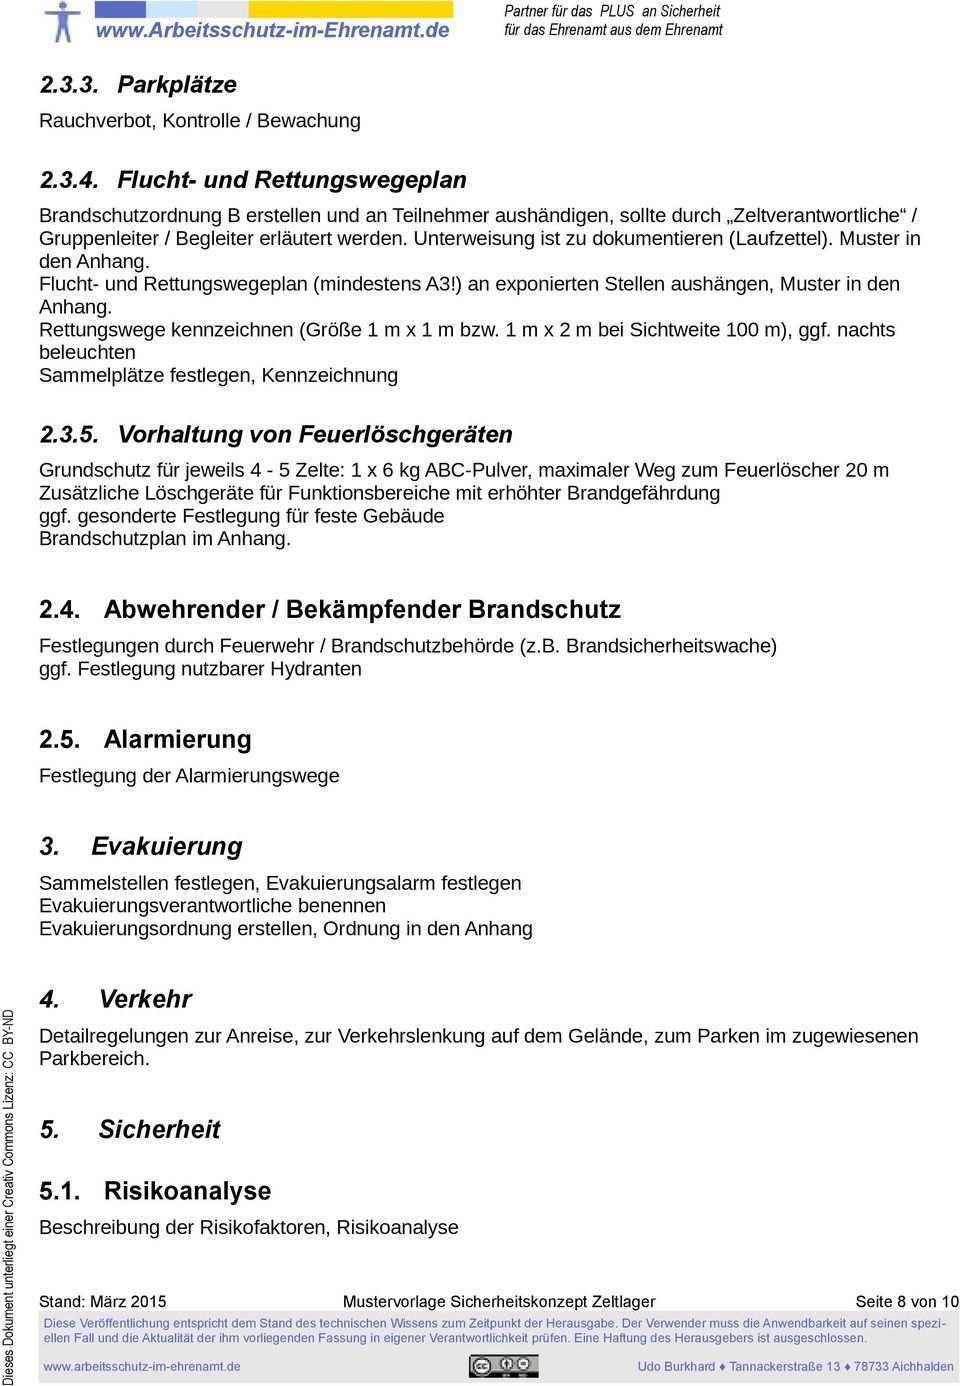 Mustervorlage Siko Sicherheitskonzept Zeltlager Pdf Free Download